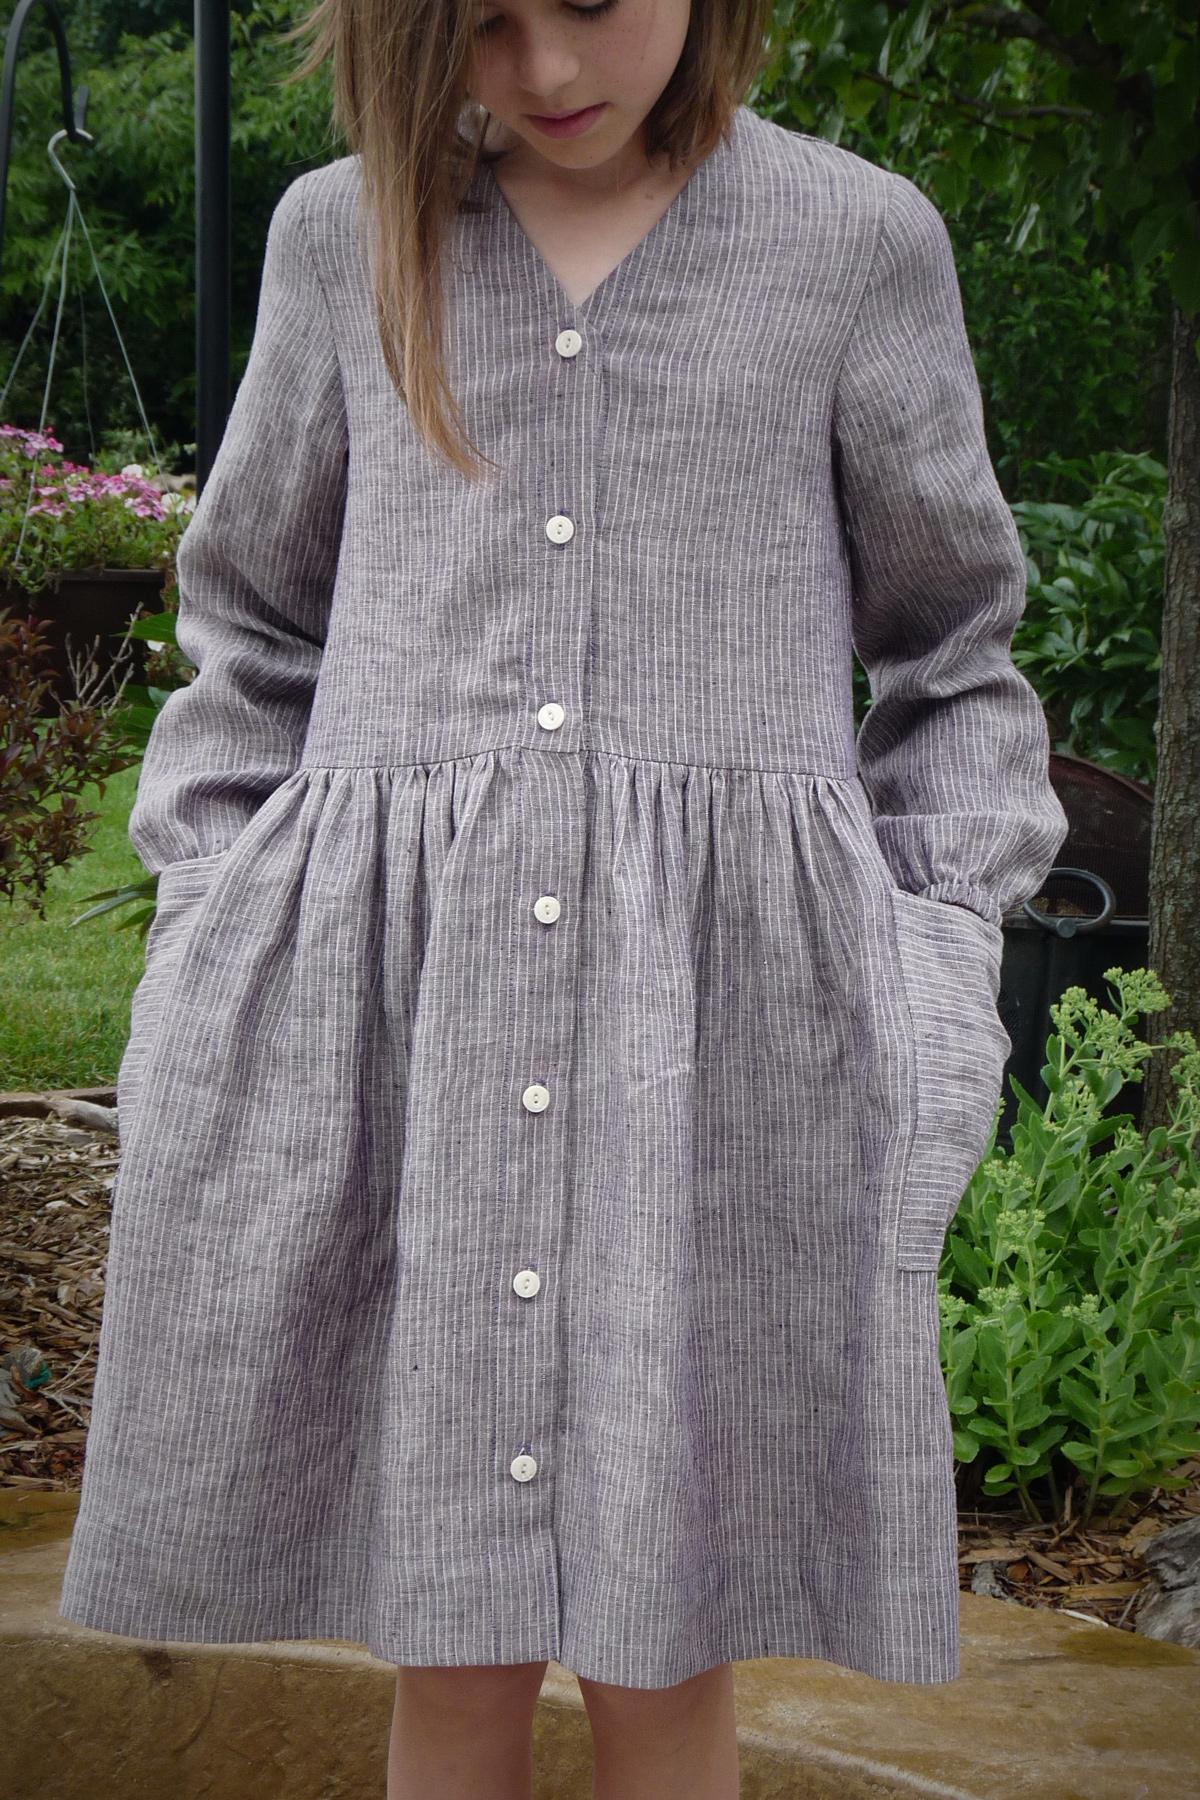 Lisa's Mini Darling Ranges dress